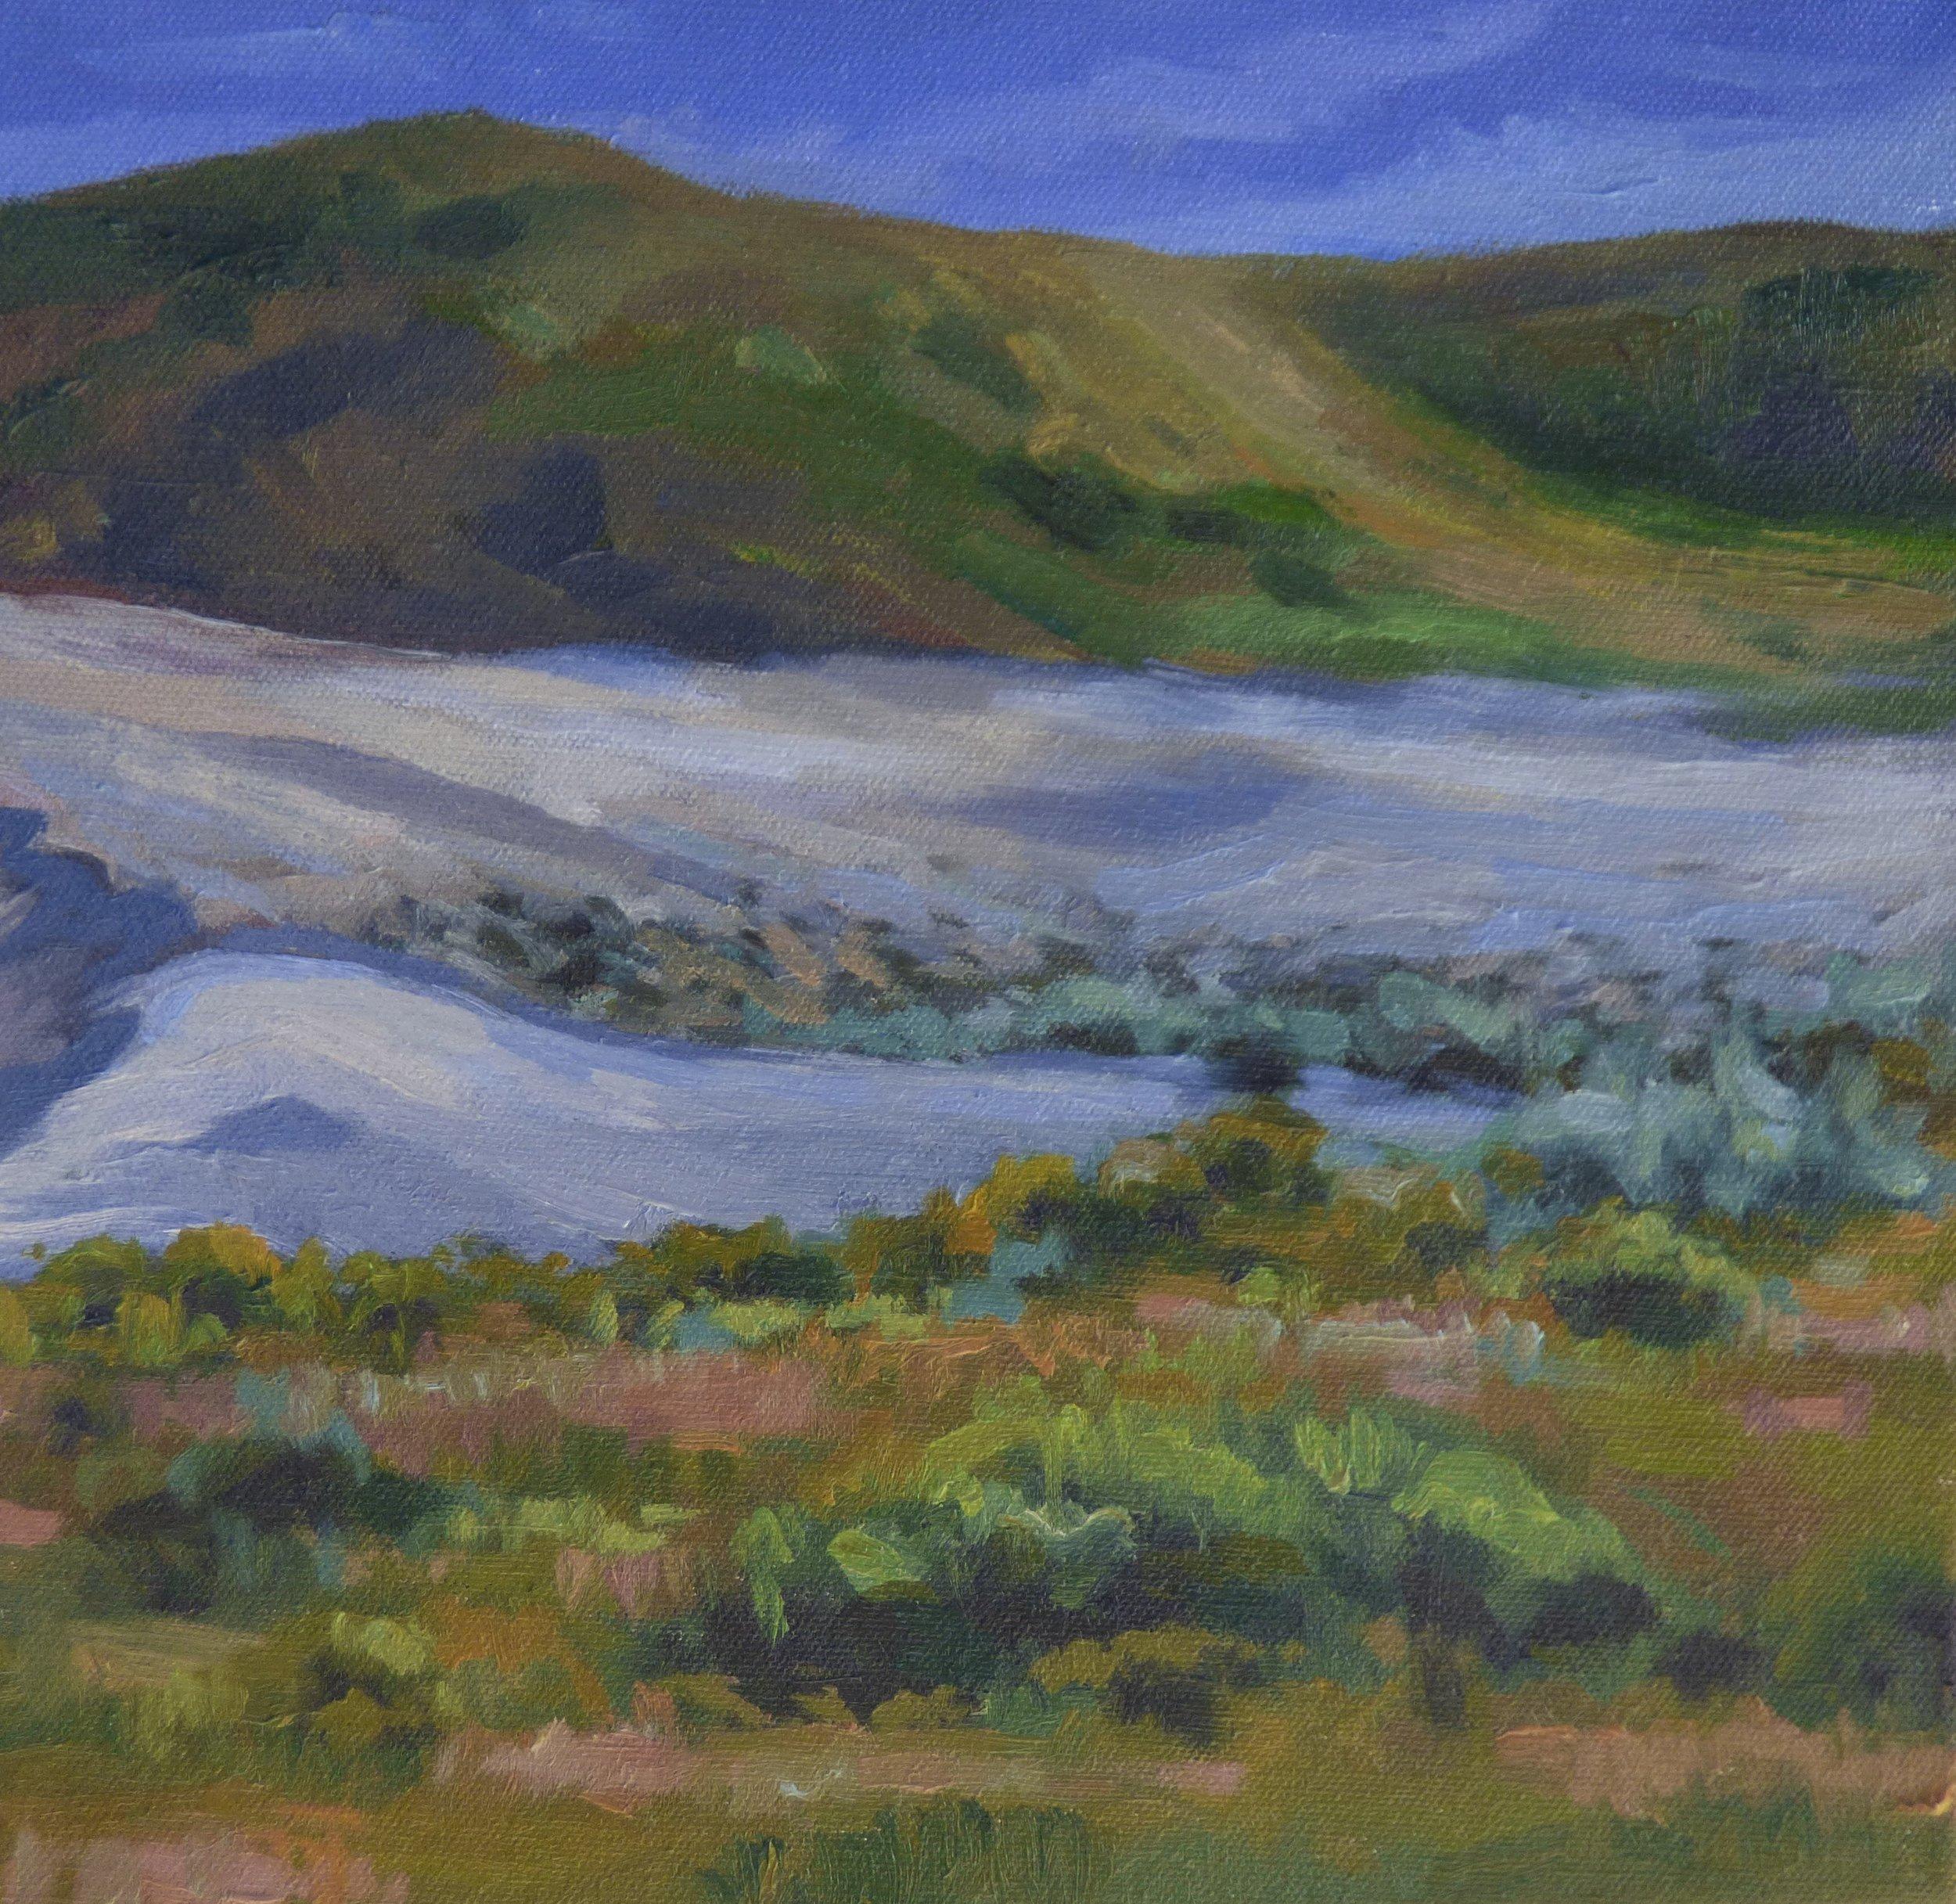 Edge of Bruneau